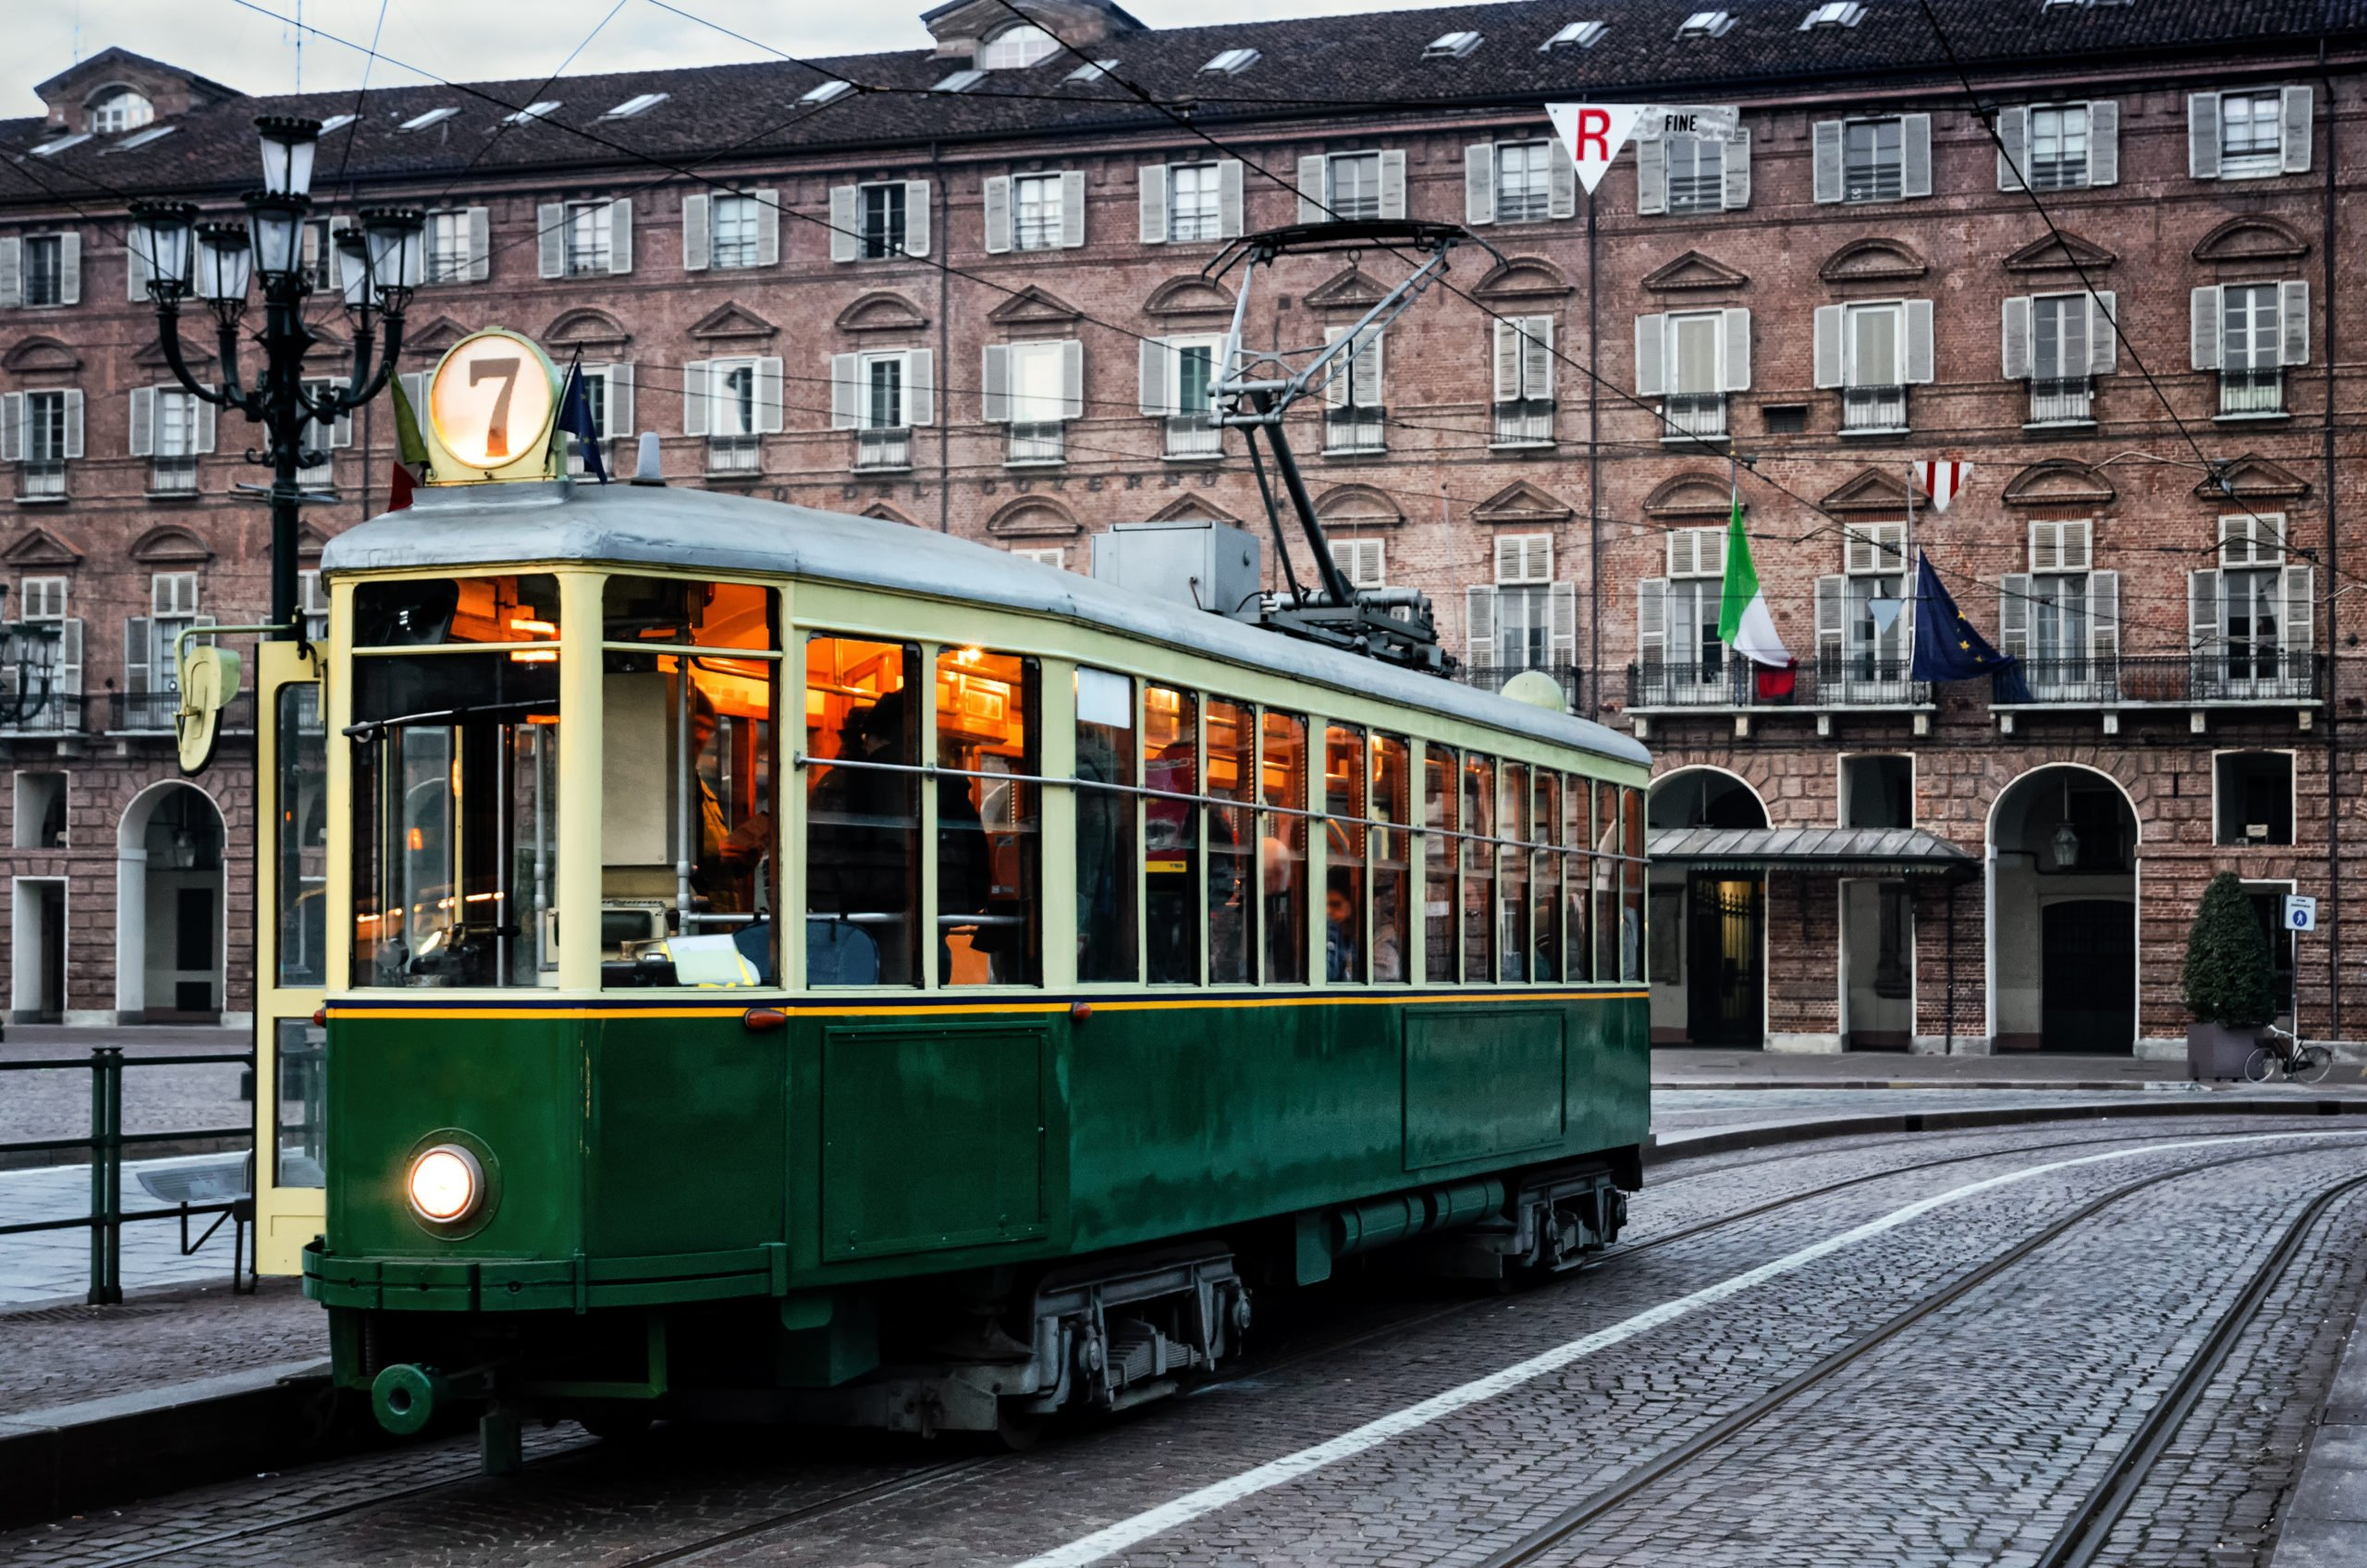 Start Your Insider Turin City Tour At Plaza Castello